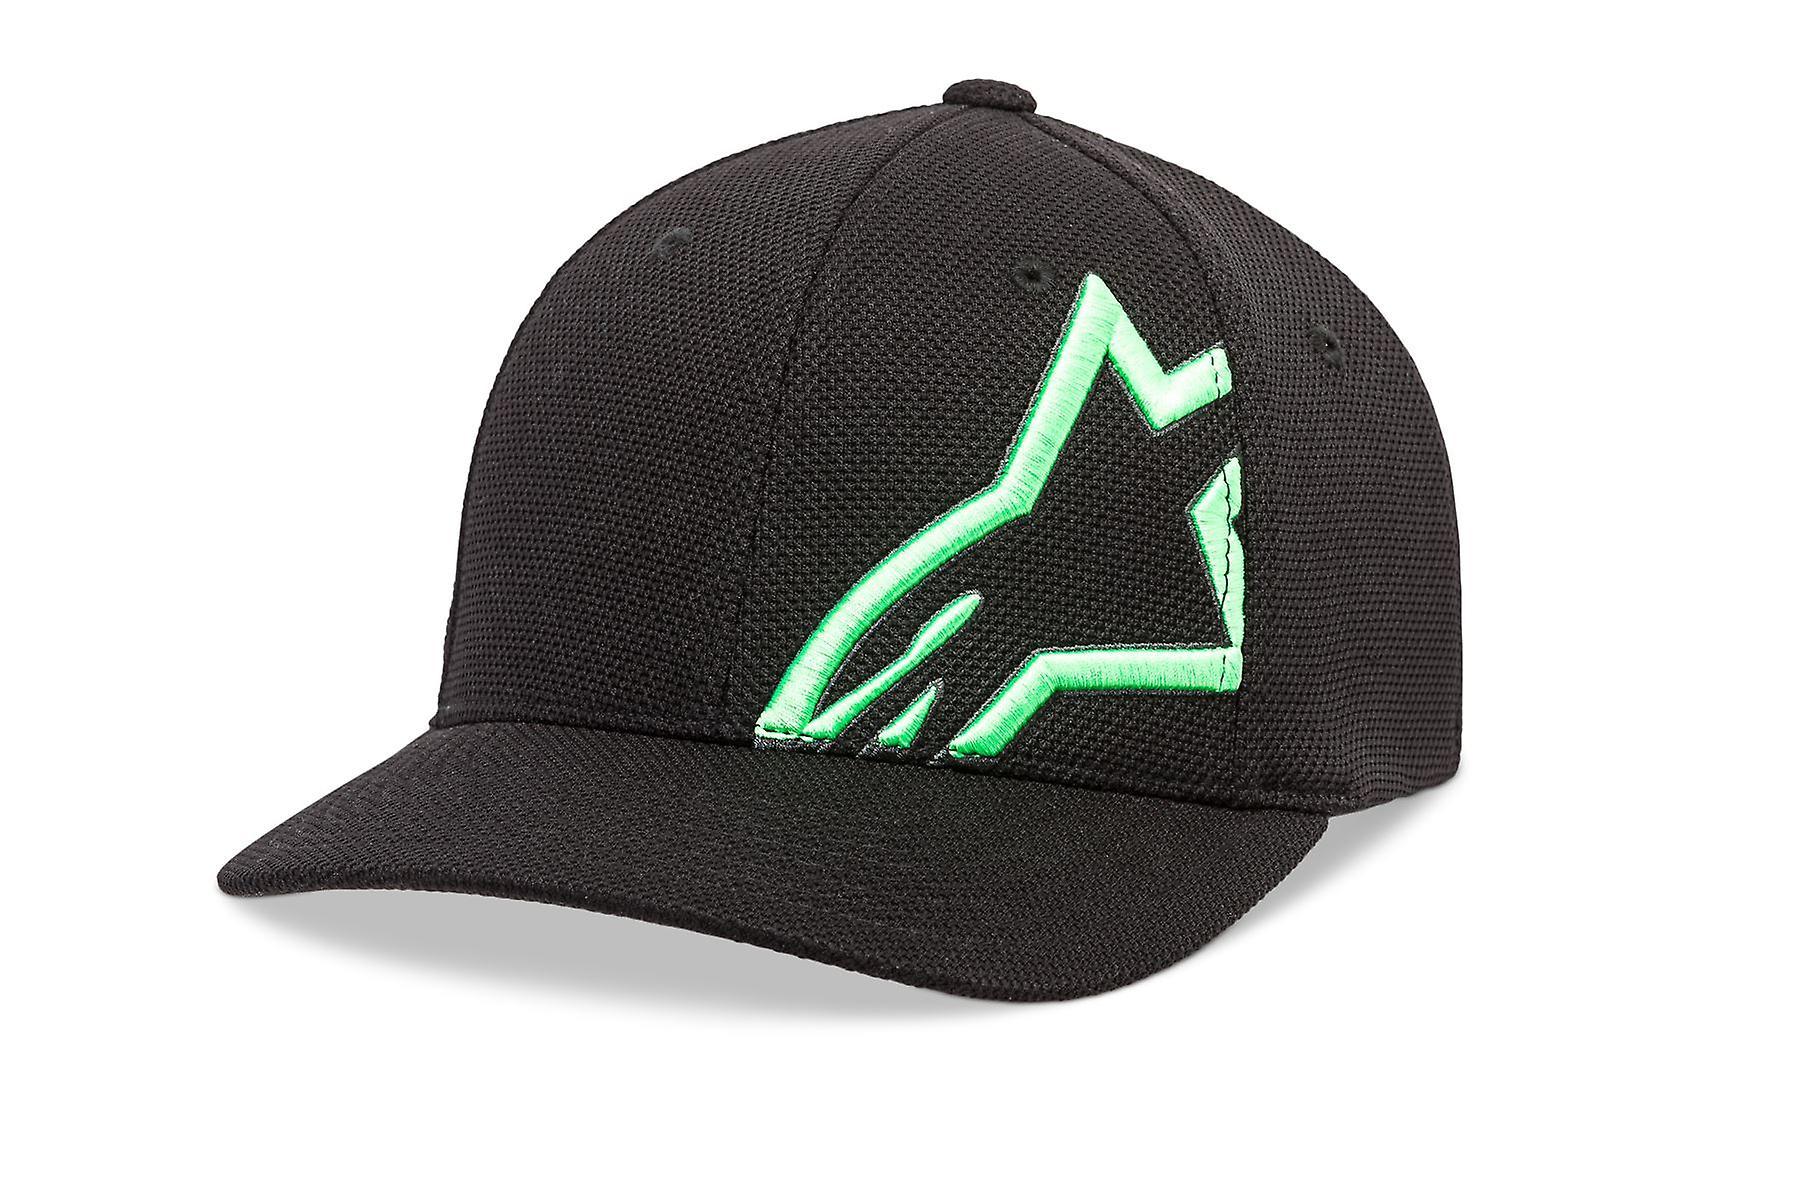 Alpinestars Mens Mock Mesh Curve Cap ~ Corp Shift black/green